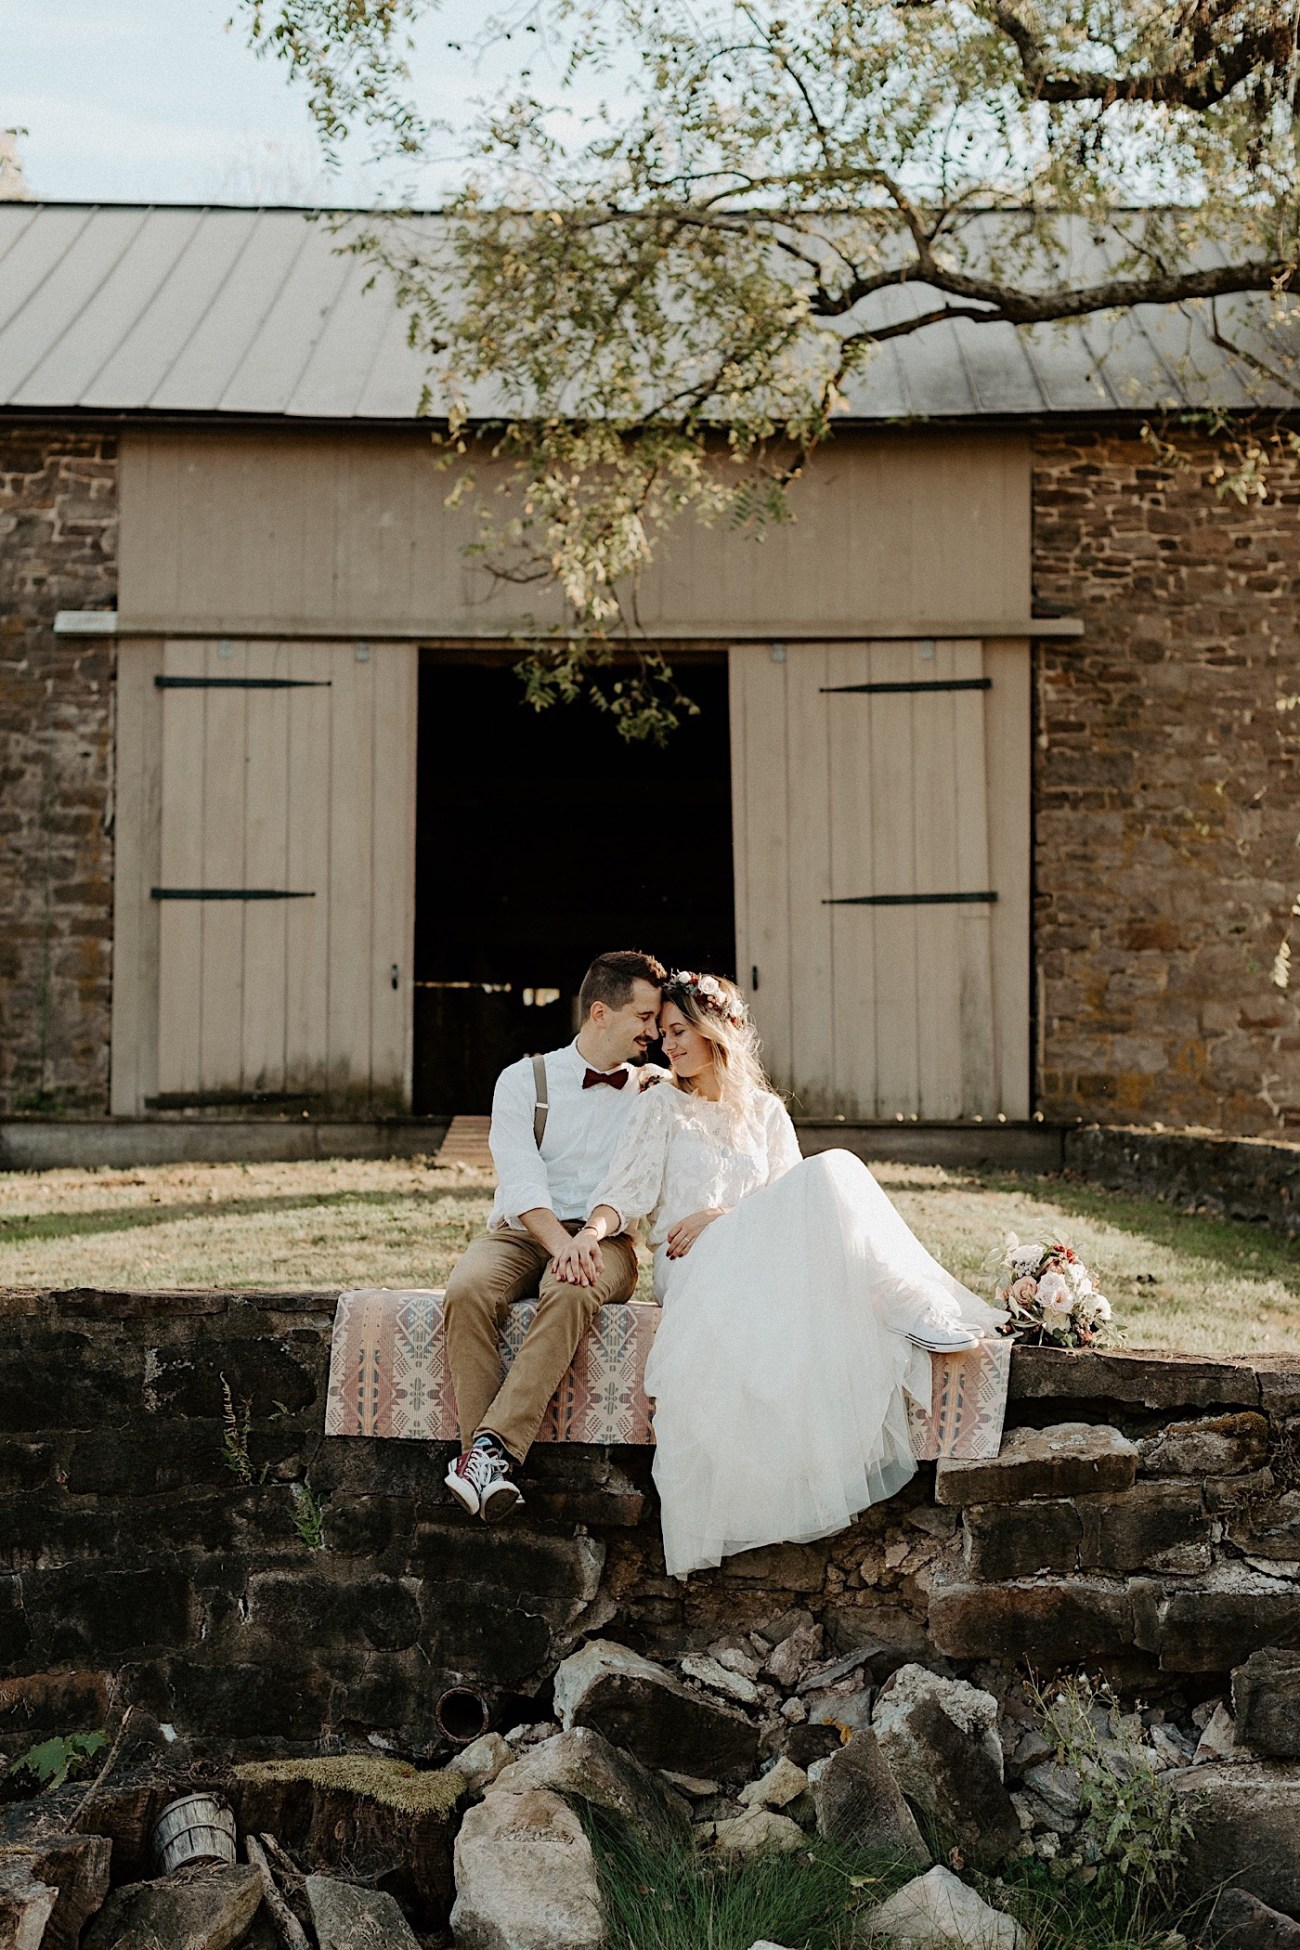 Woolverton Inn Elopement NJ Wedding Photographer Boho Wedding 027